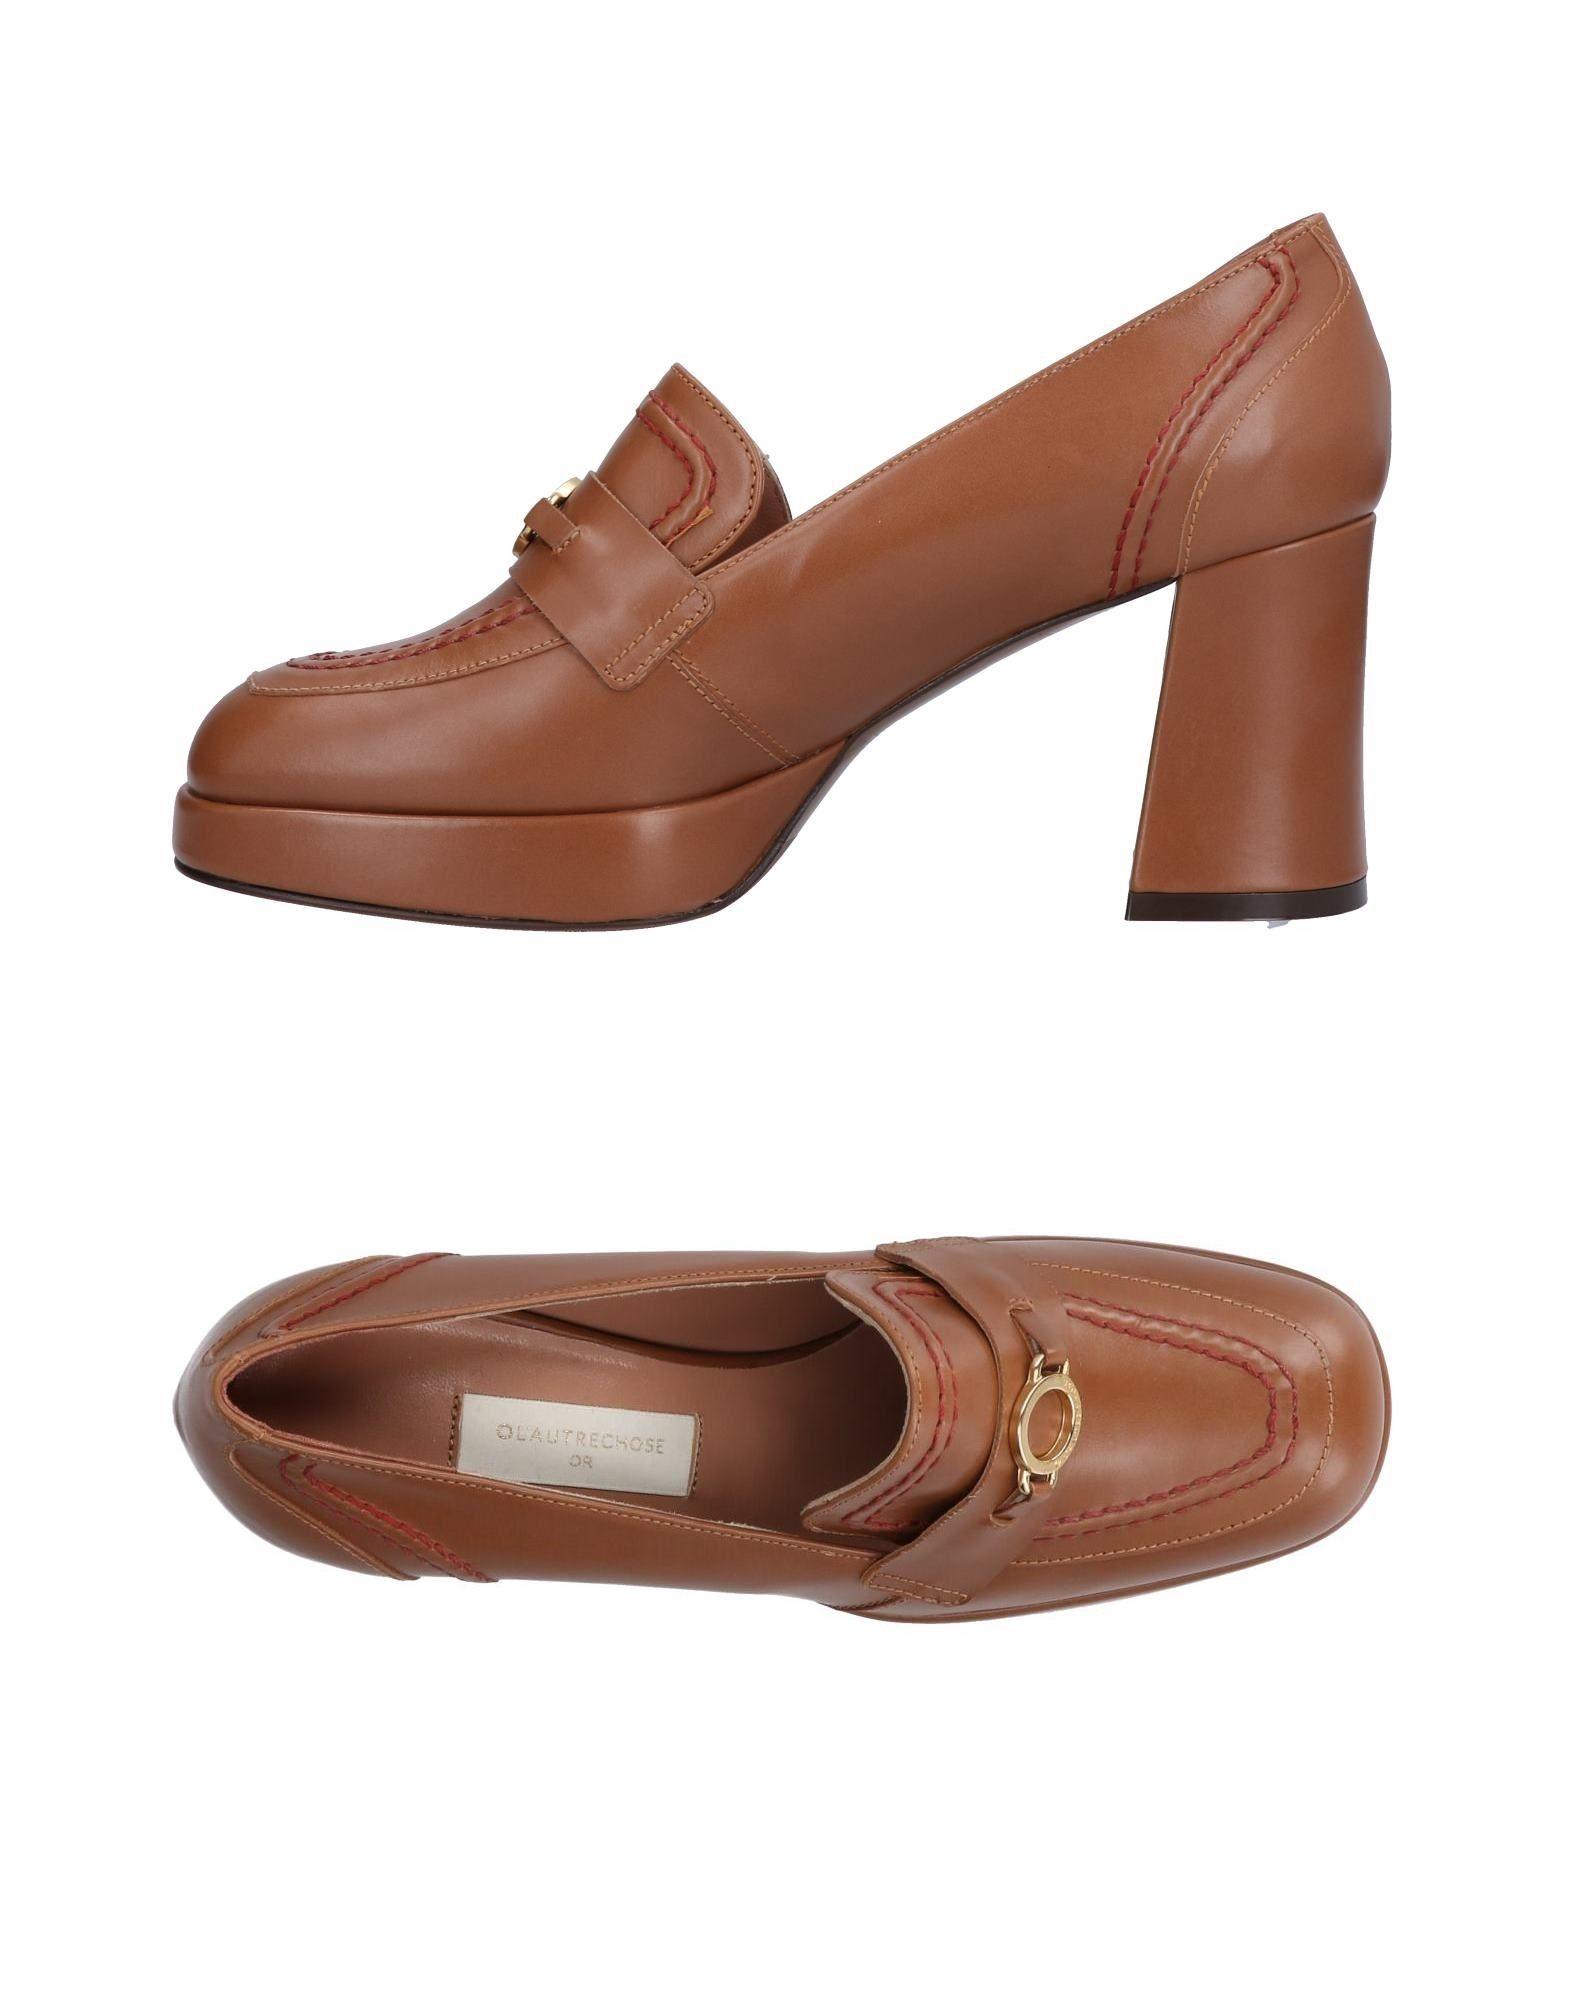 L' Autre Chose Mokassins Damen  11487371MGGut aussehende strapazierfähige Schuhe